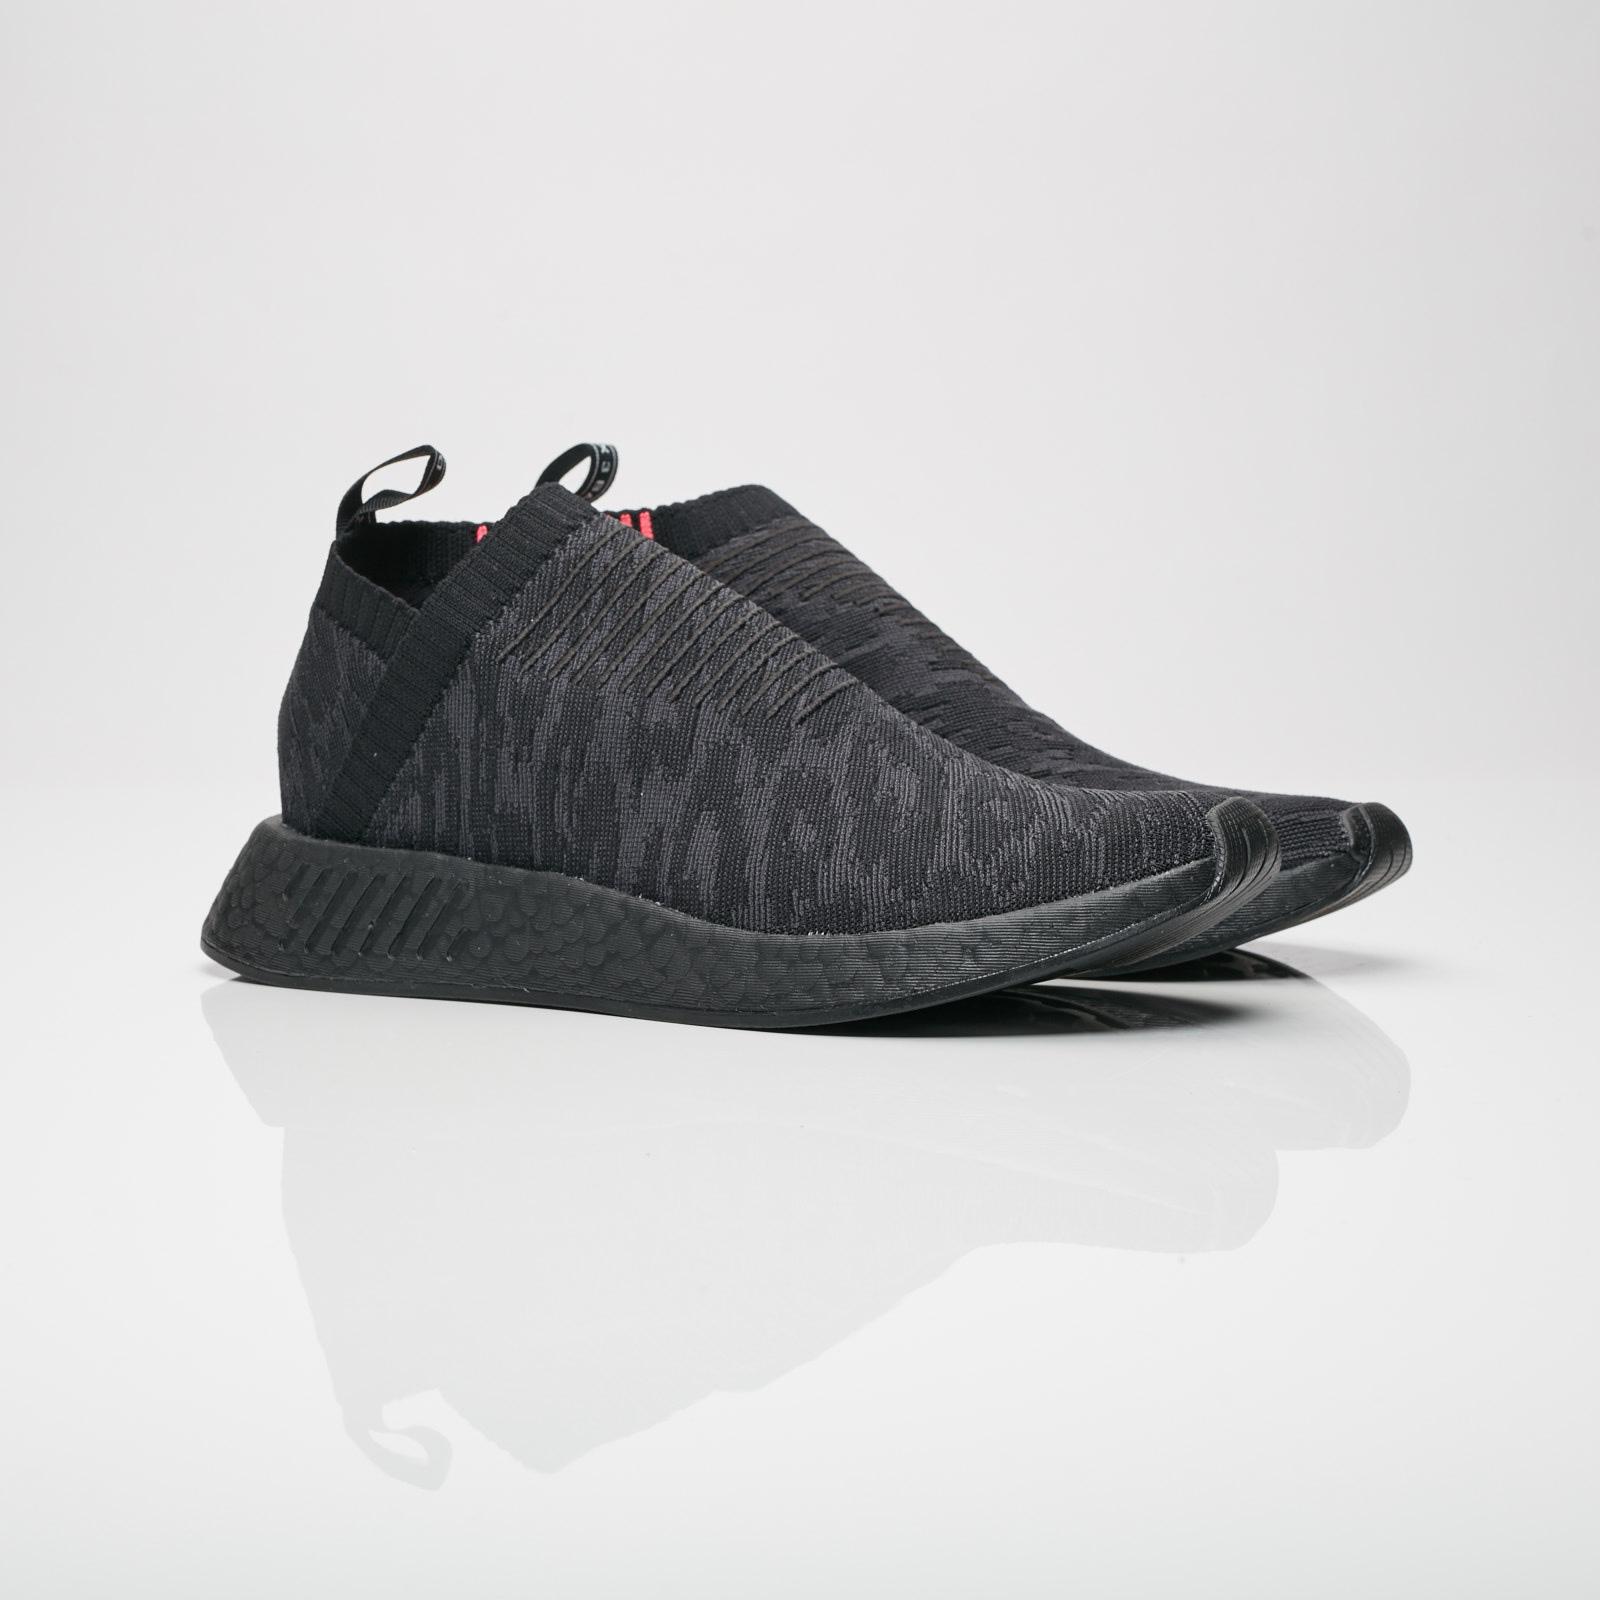 4a022f774f67e adidas NMD CS2 PK - Cq2373 - Sneakersnstuff